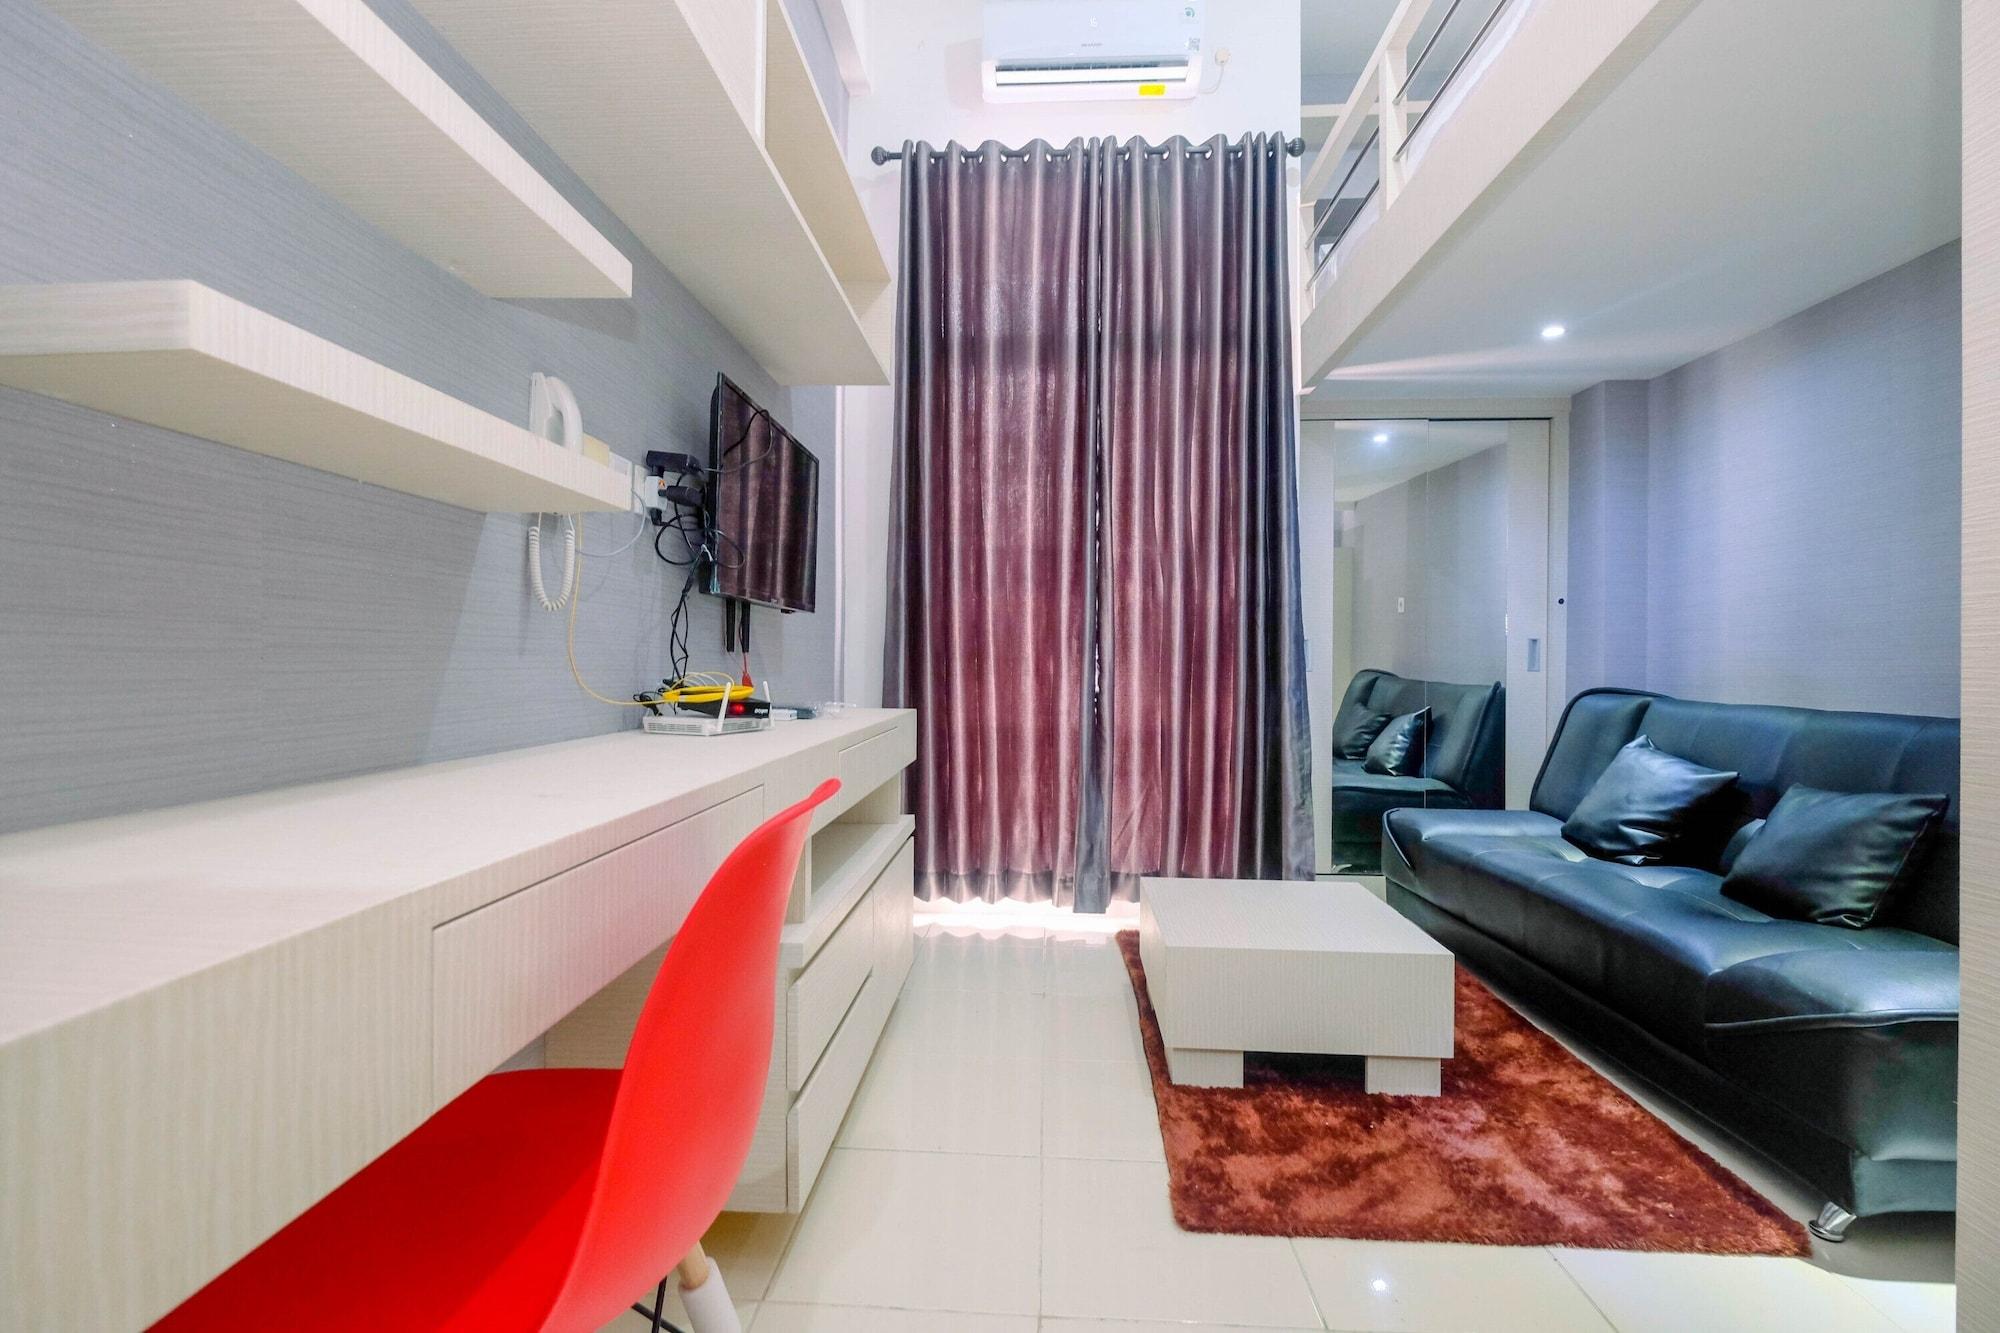 Minimalist and Stylish Studio Dave Apartment By Travelio, Depok